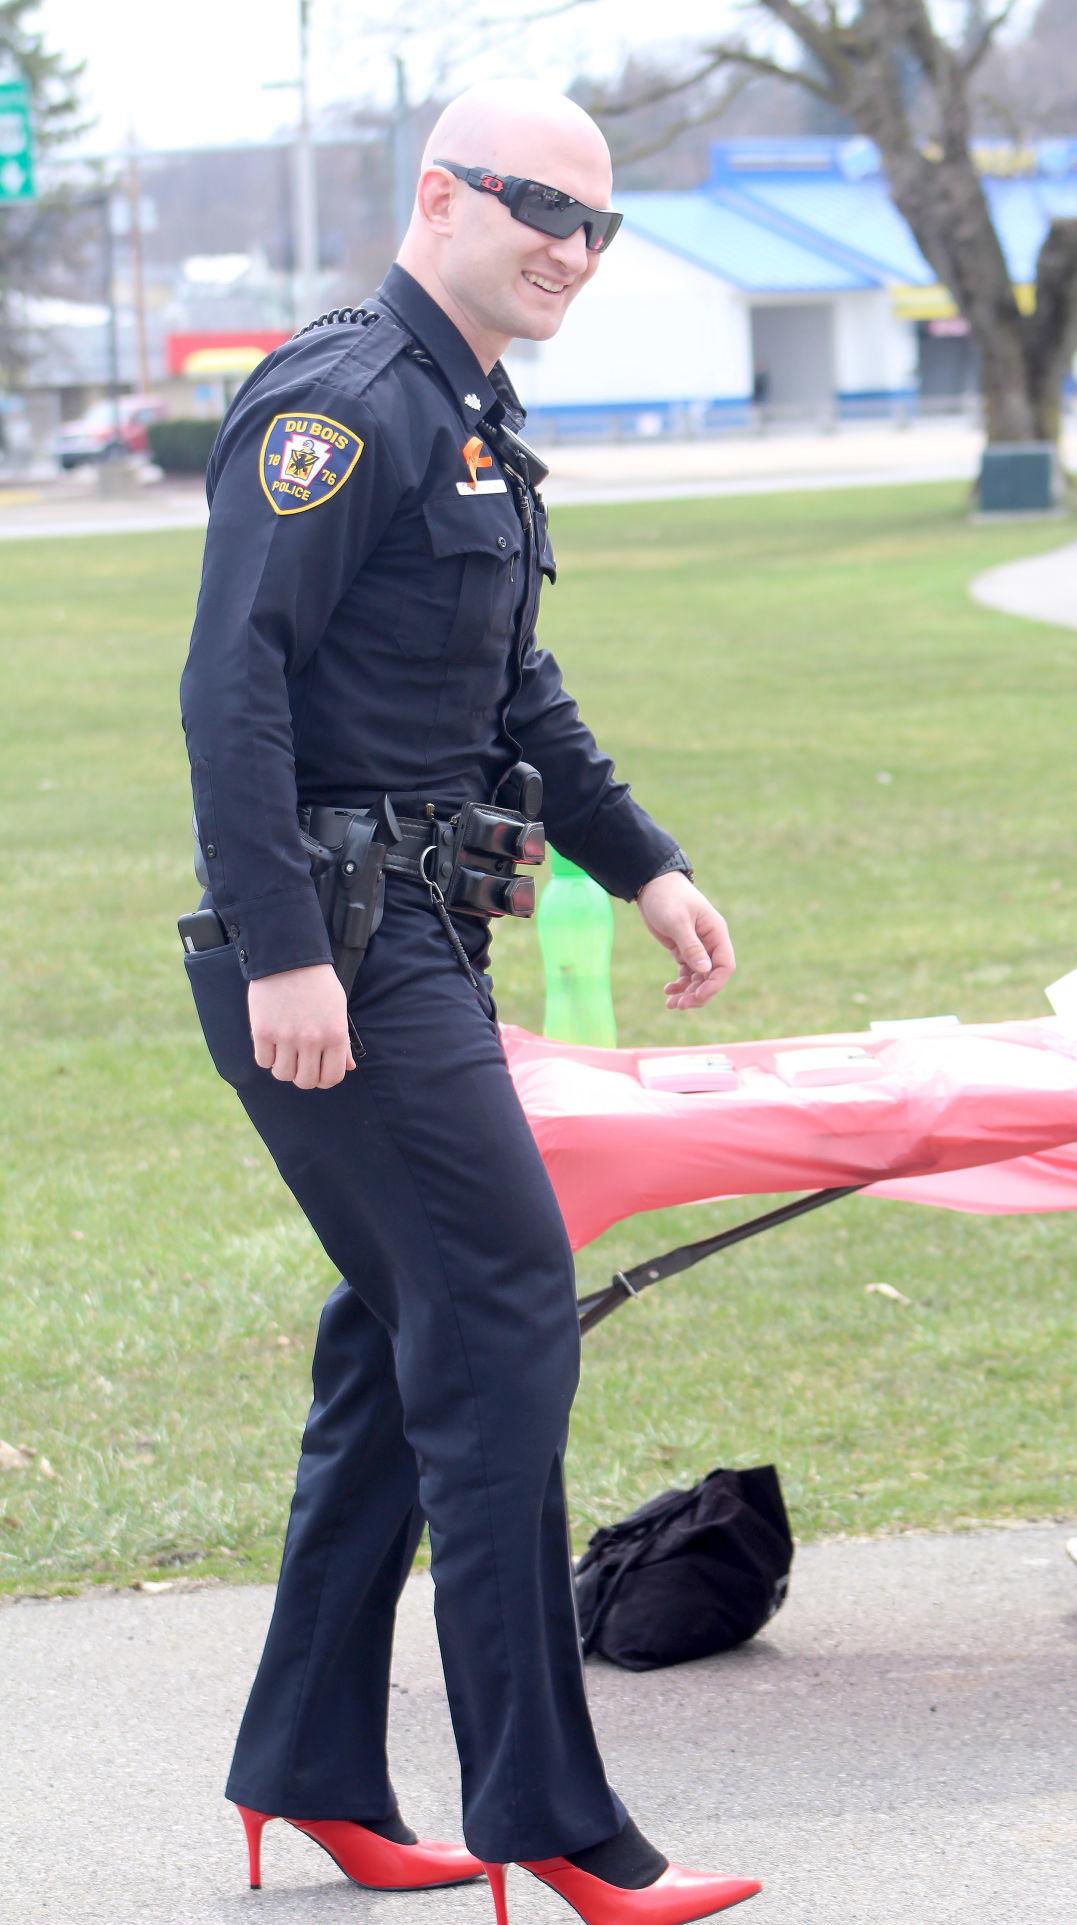 Officer Lance Thompson wear red high heels